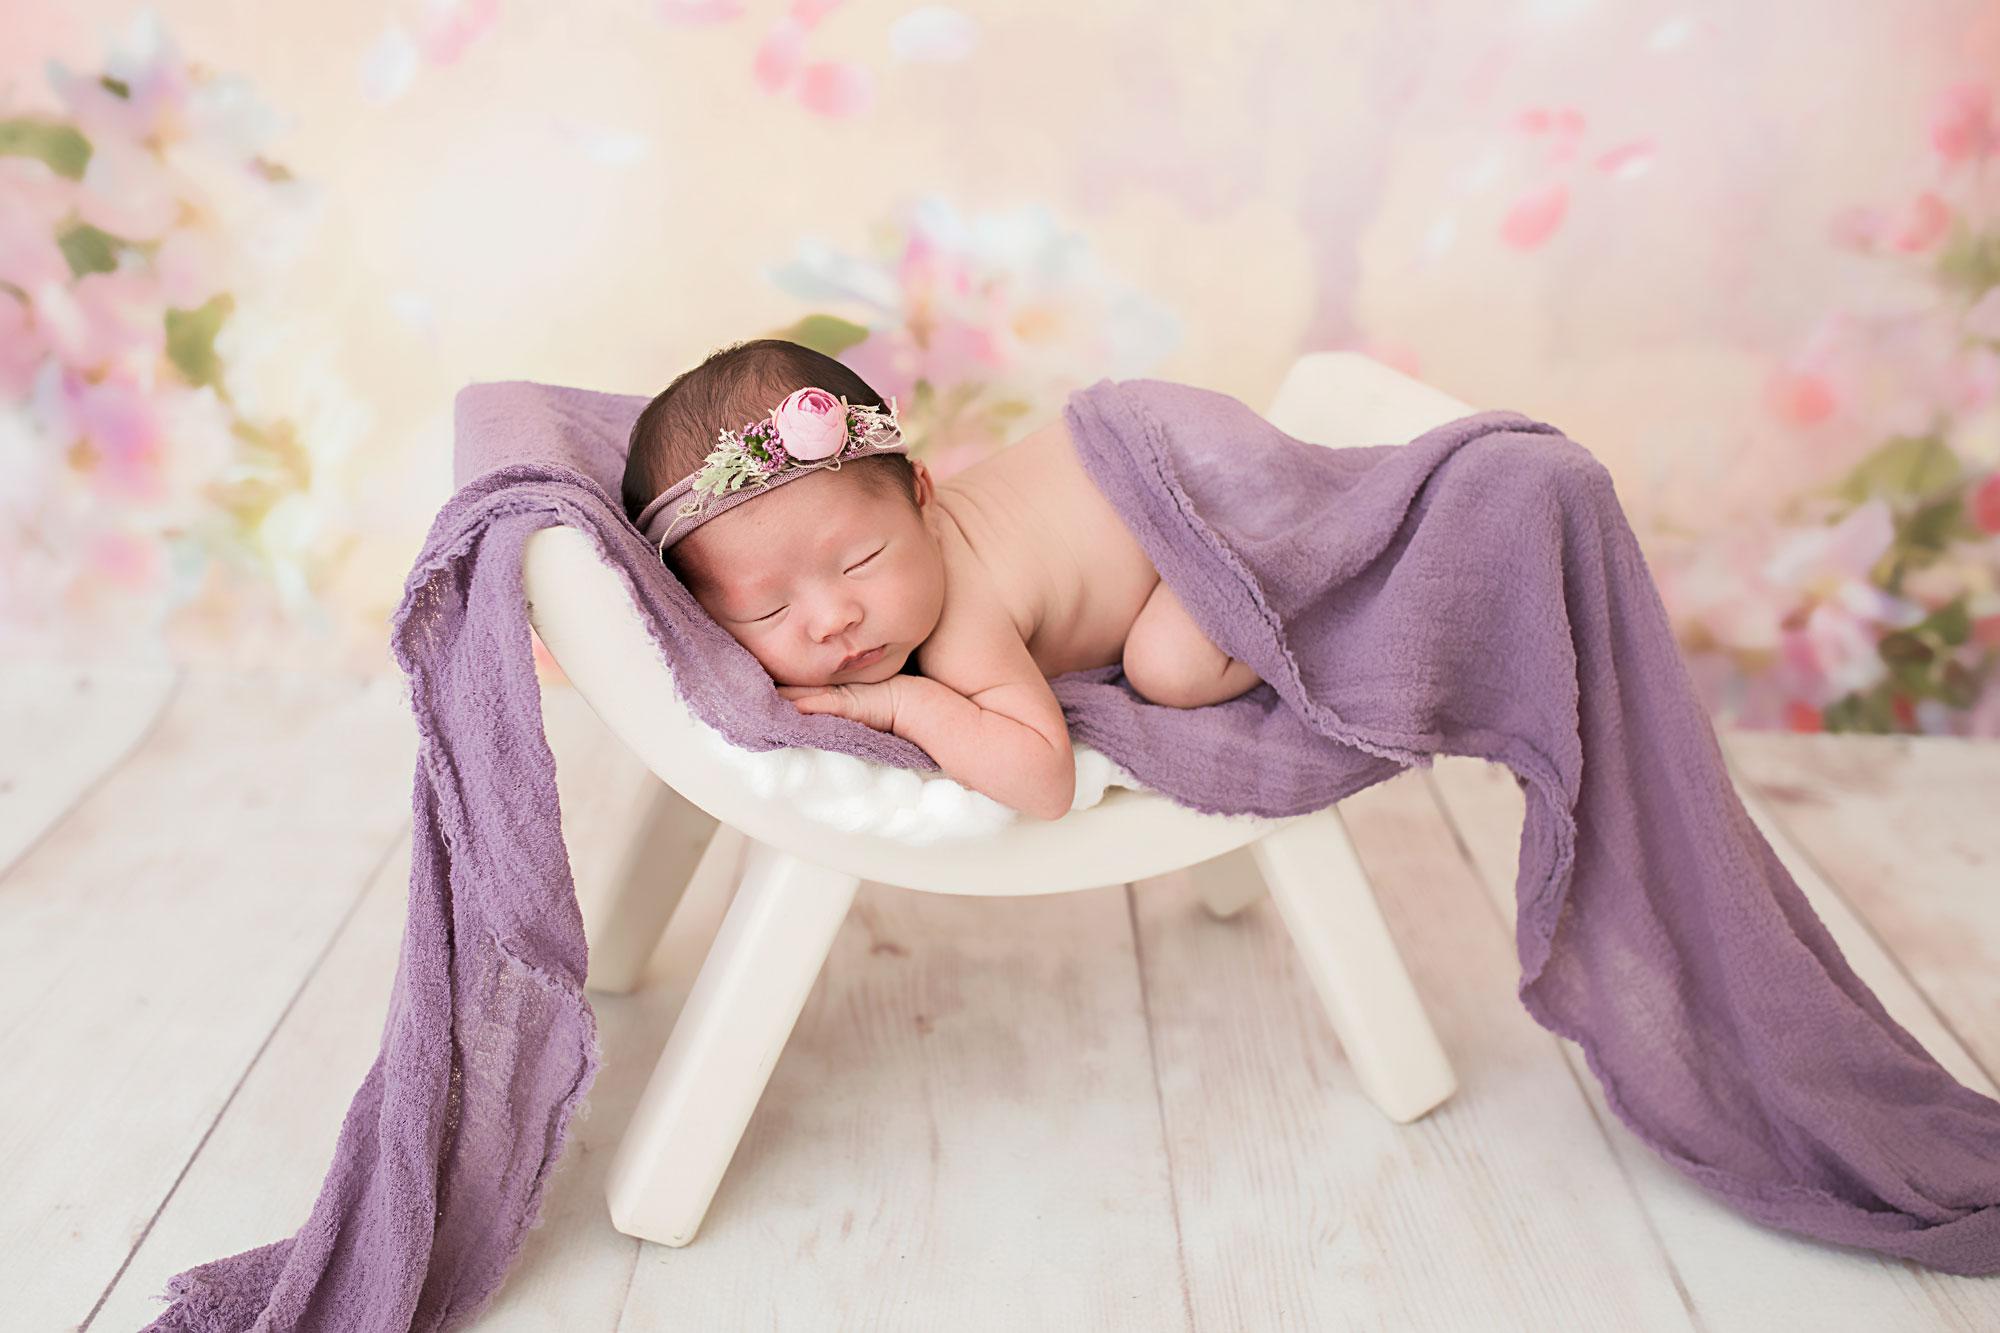 knoxville-photography-studio-newborn-baby-sequoyah-hills.jpg